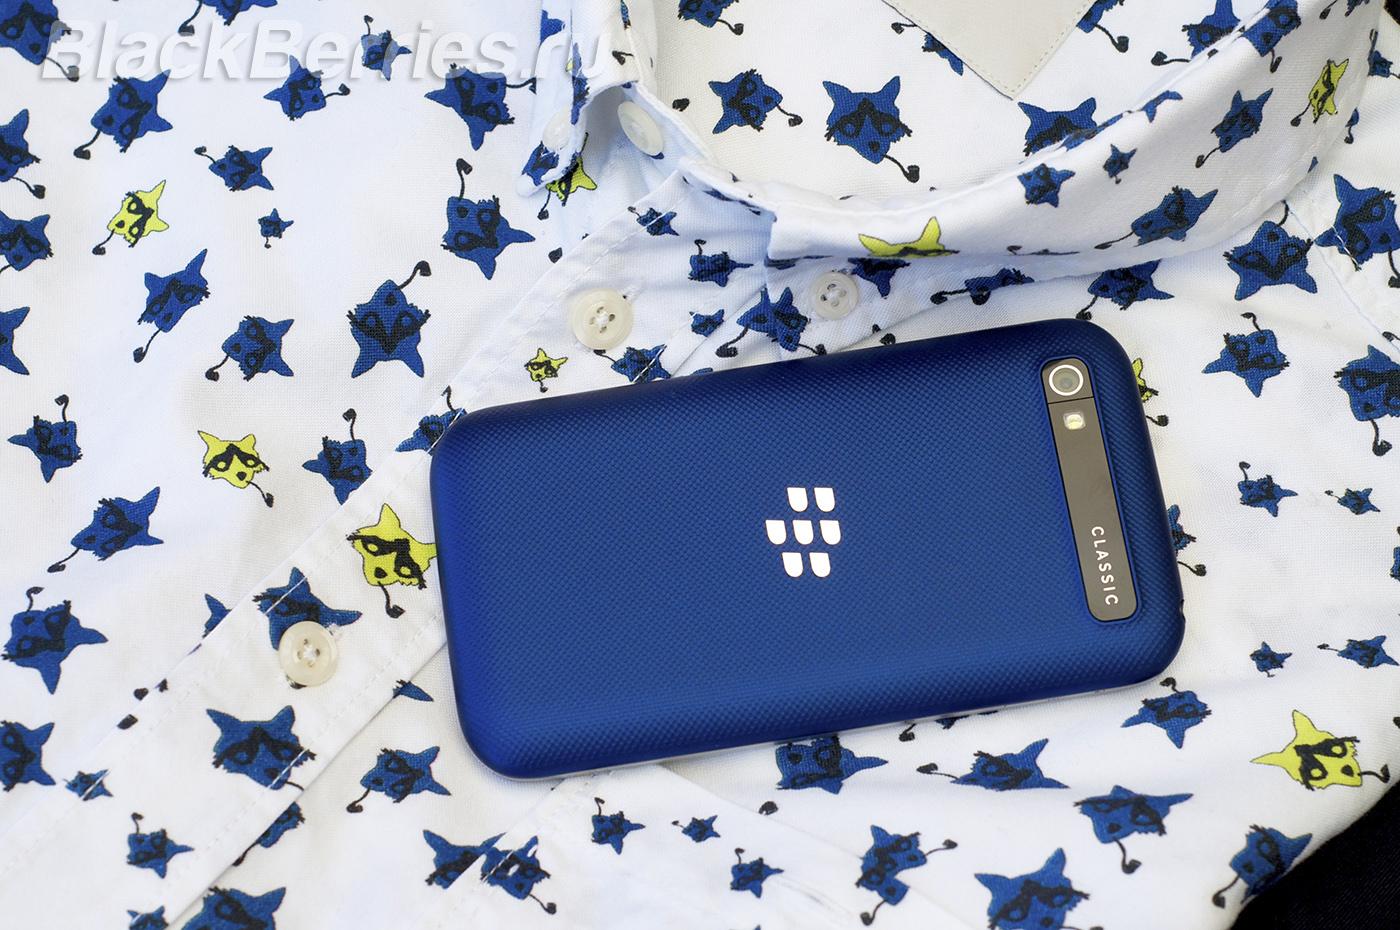 BlackBerry-Classic-Blue-Cobalt-23